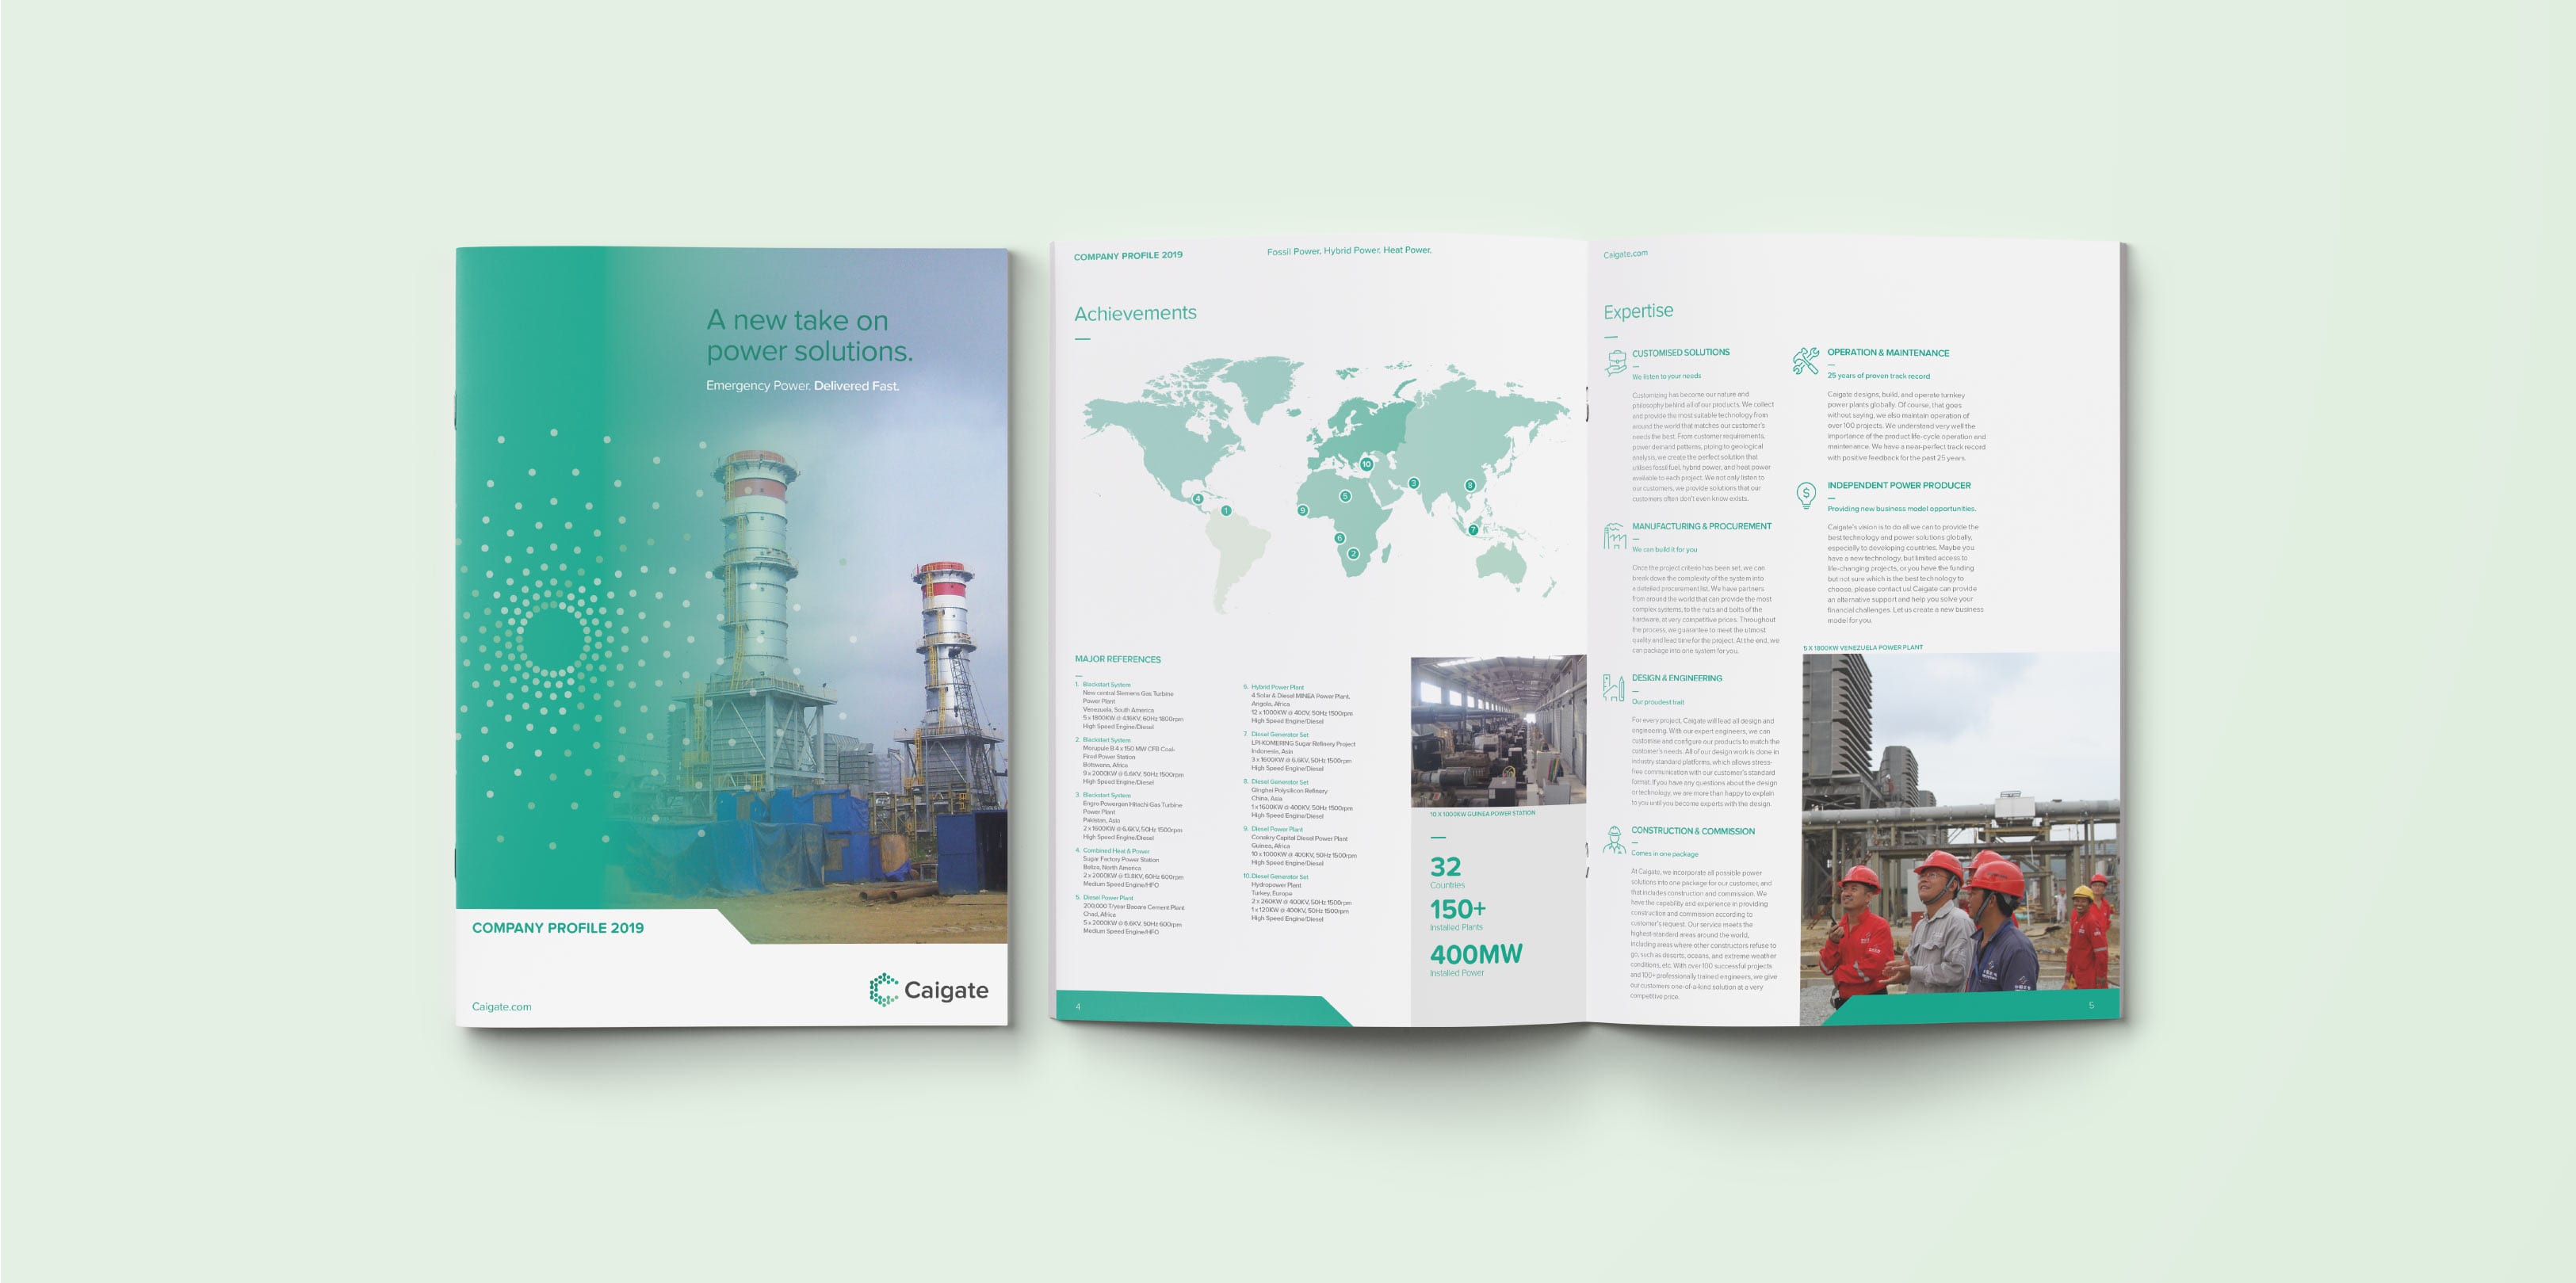 Caigate Brochure